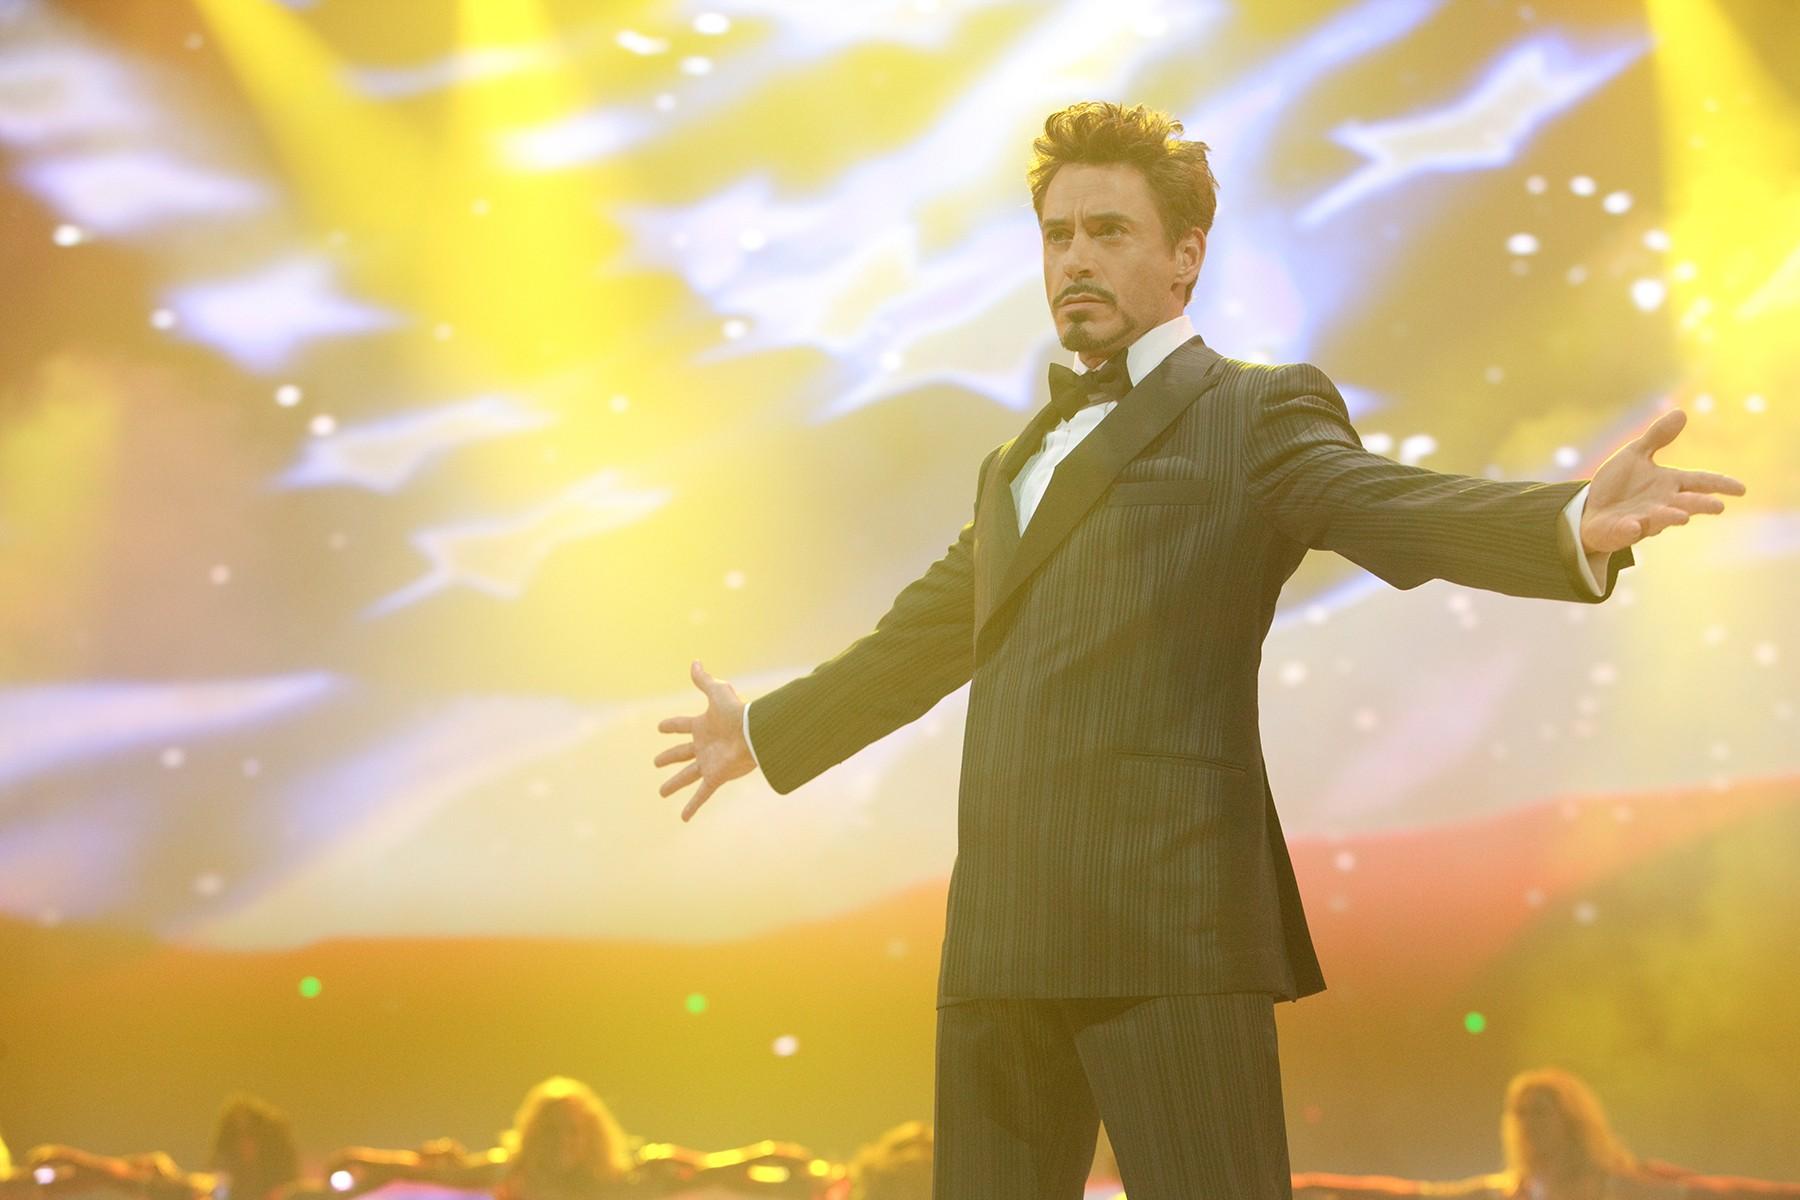 Handsome Robert Downey Jr Meme